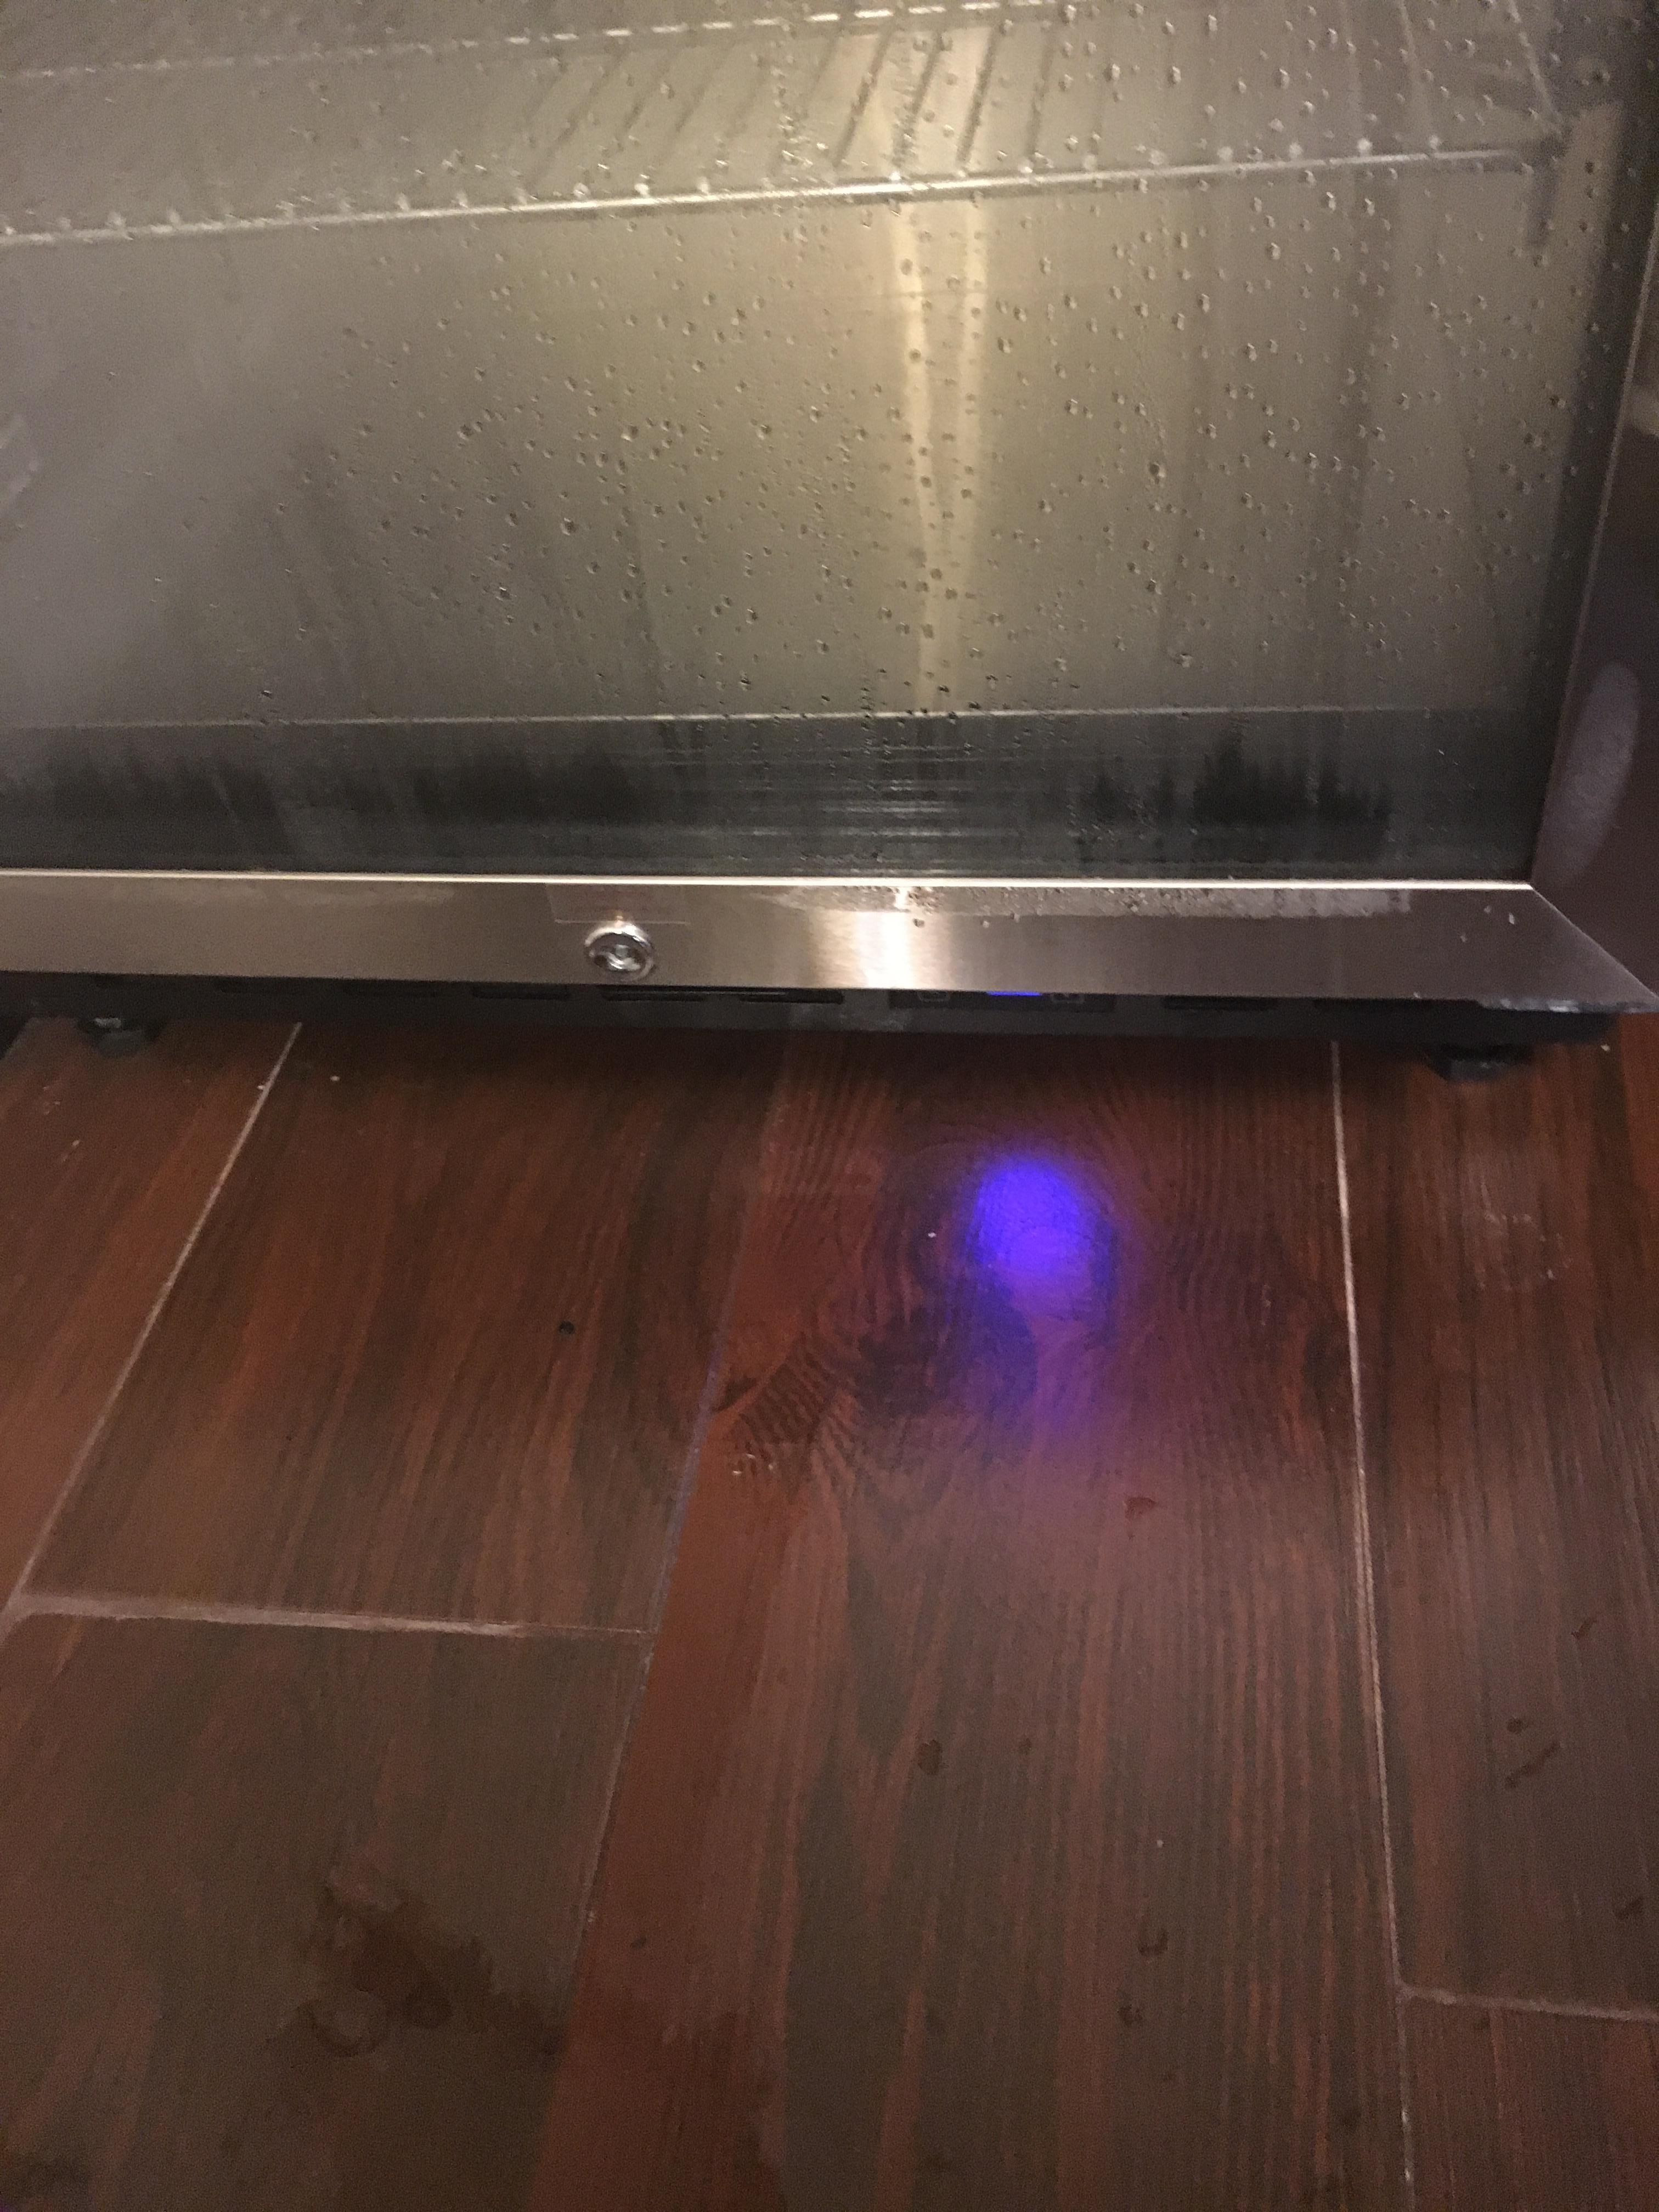 Leaky fridge